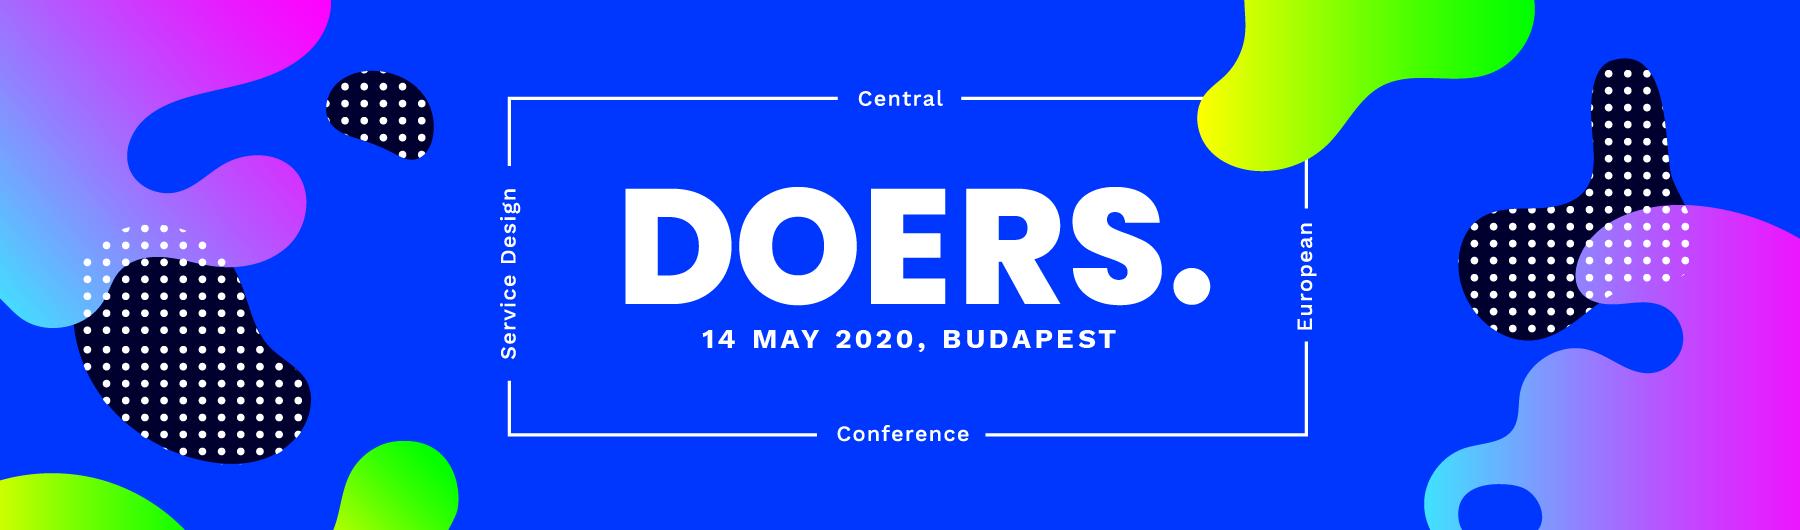 DOERS 2020 - Central European Service Design Conference